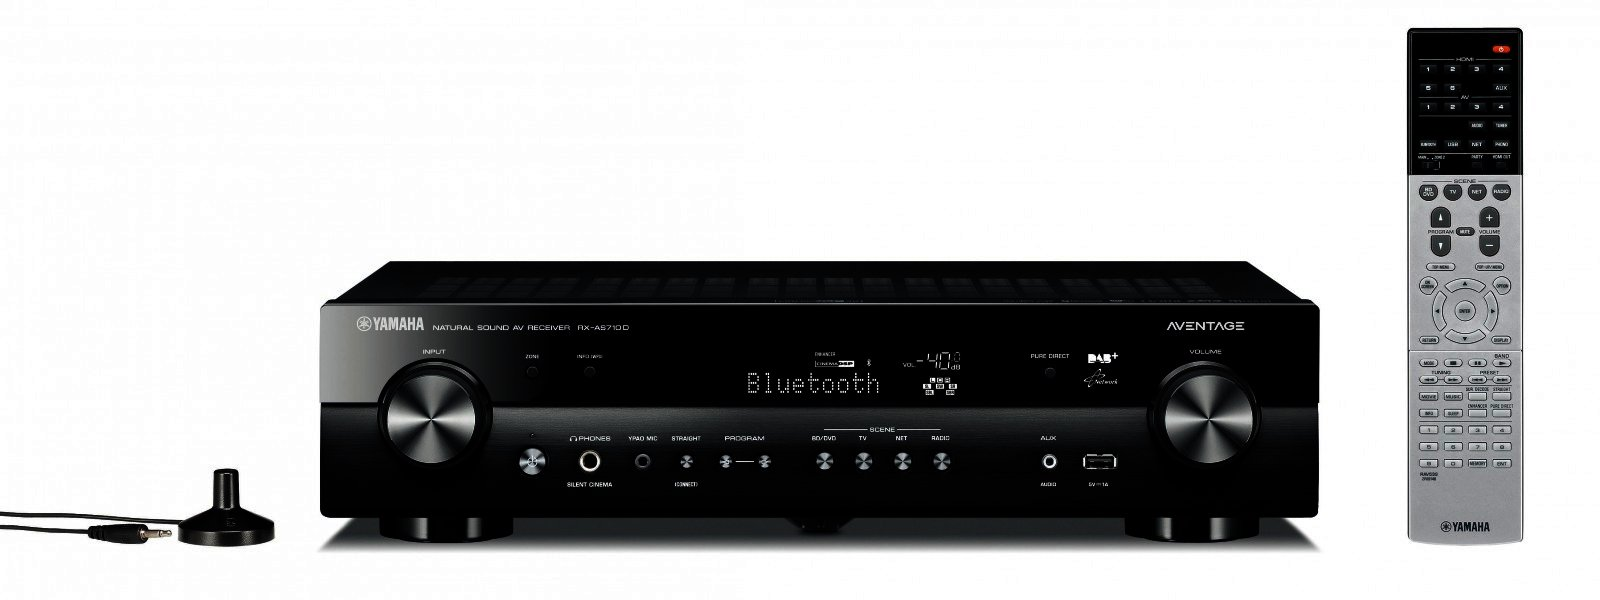 yamaha rx as710d heimkino receiver av receiver kaufen musikus hifi shop. Black Bedroom Furniture Sets. Home Design Ideas